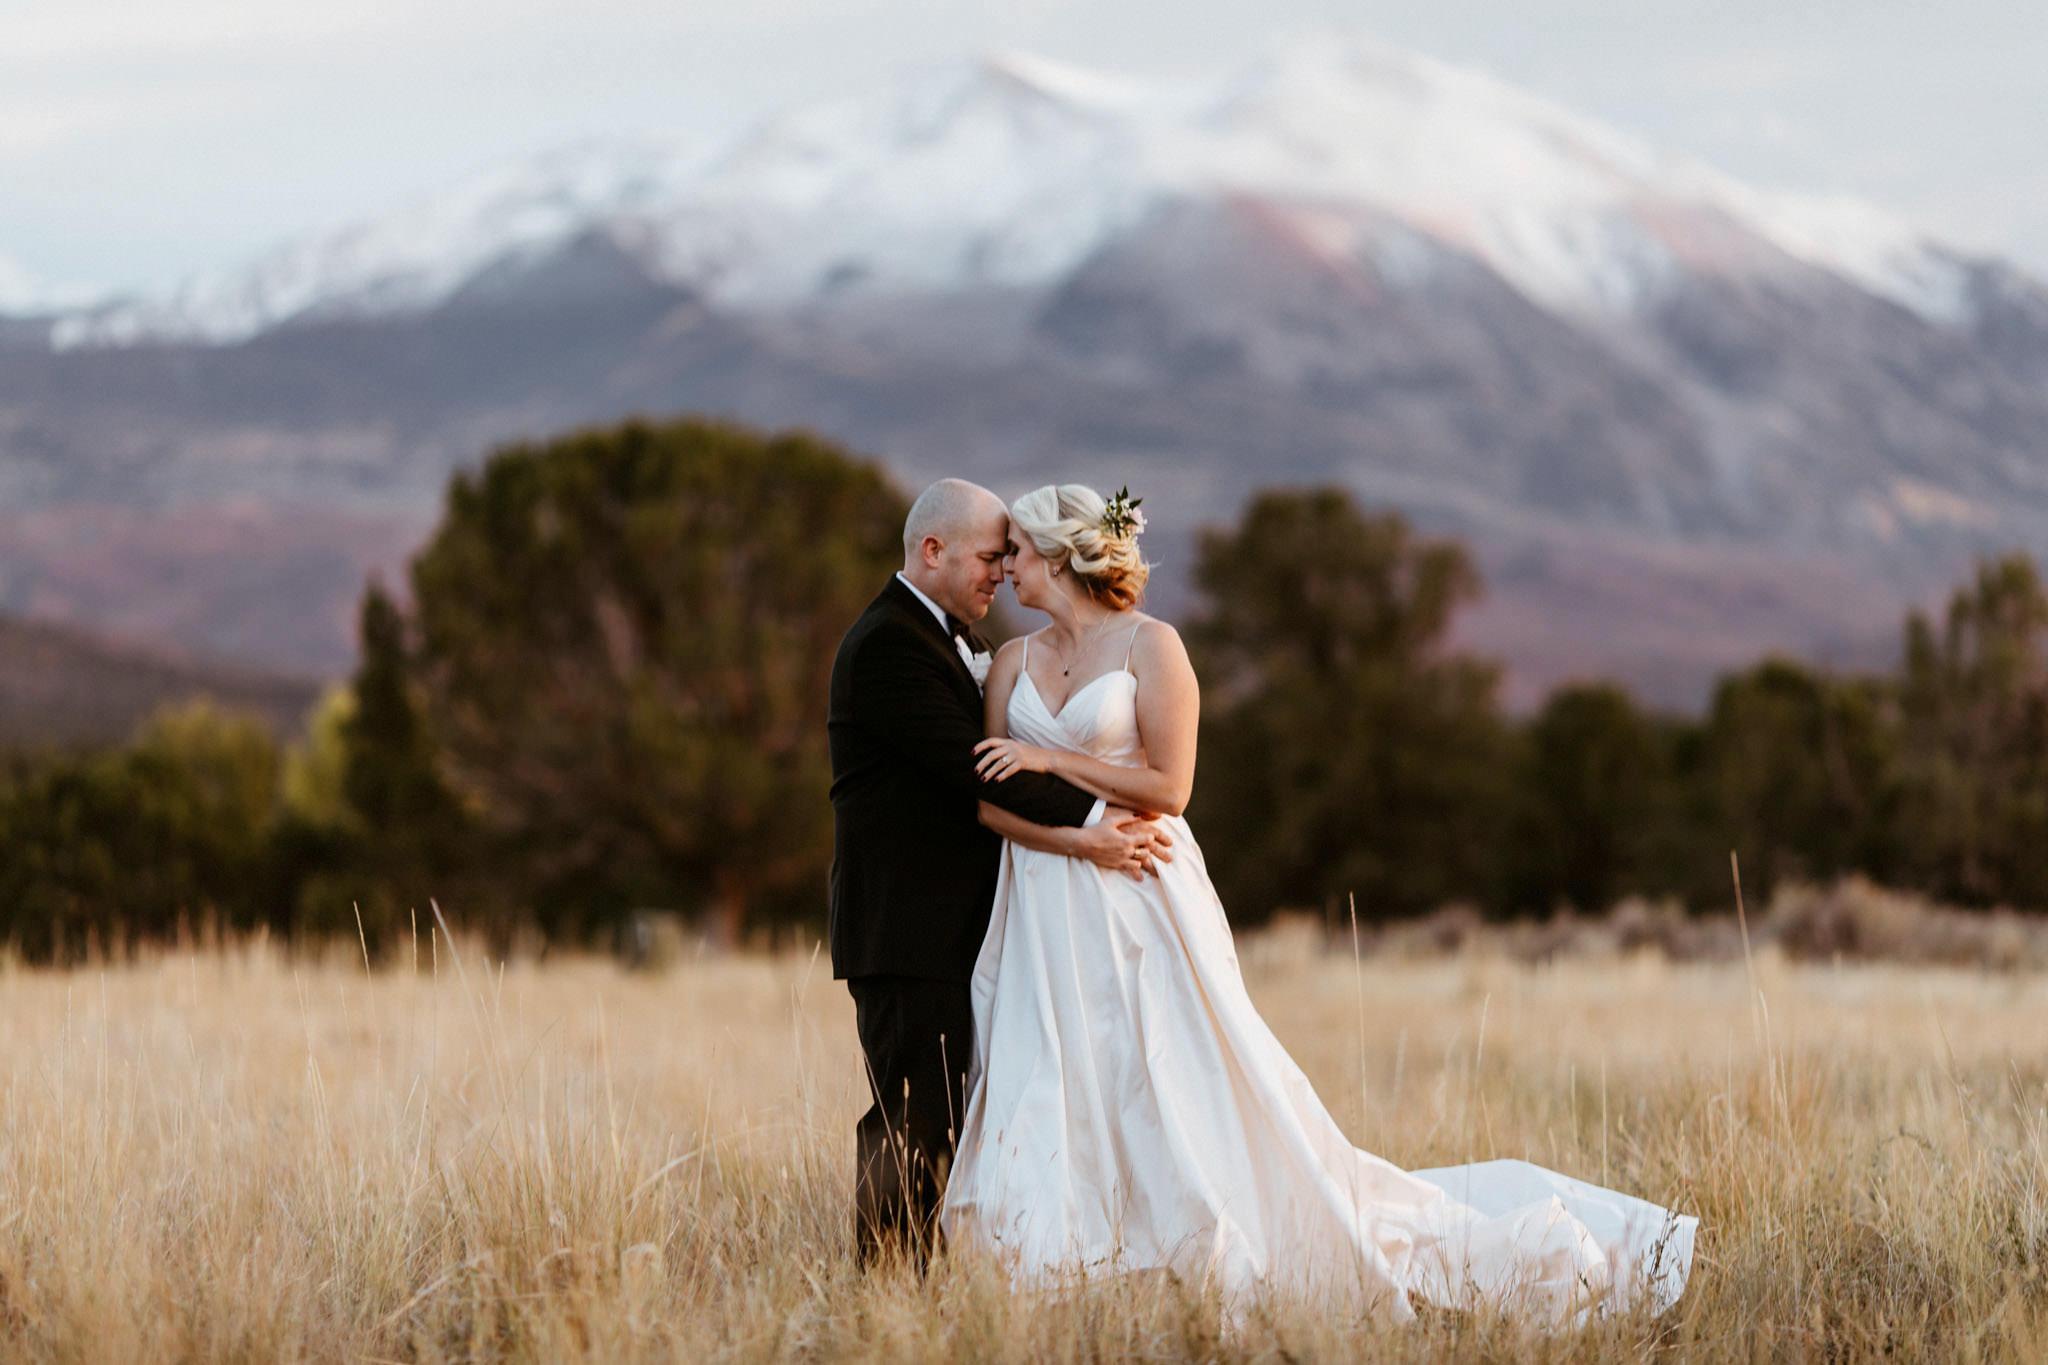 08Aspen Colorado Wedding_Kindling Wedding Photography_09.JPG